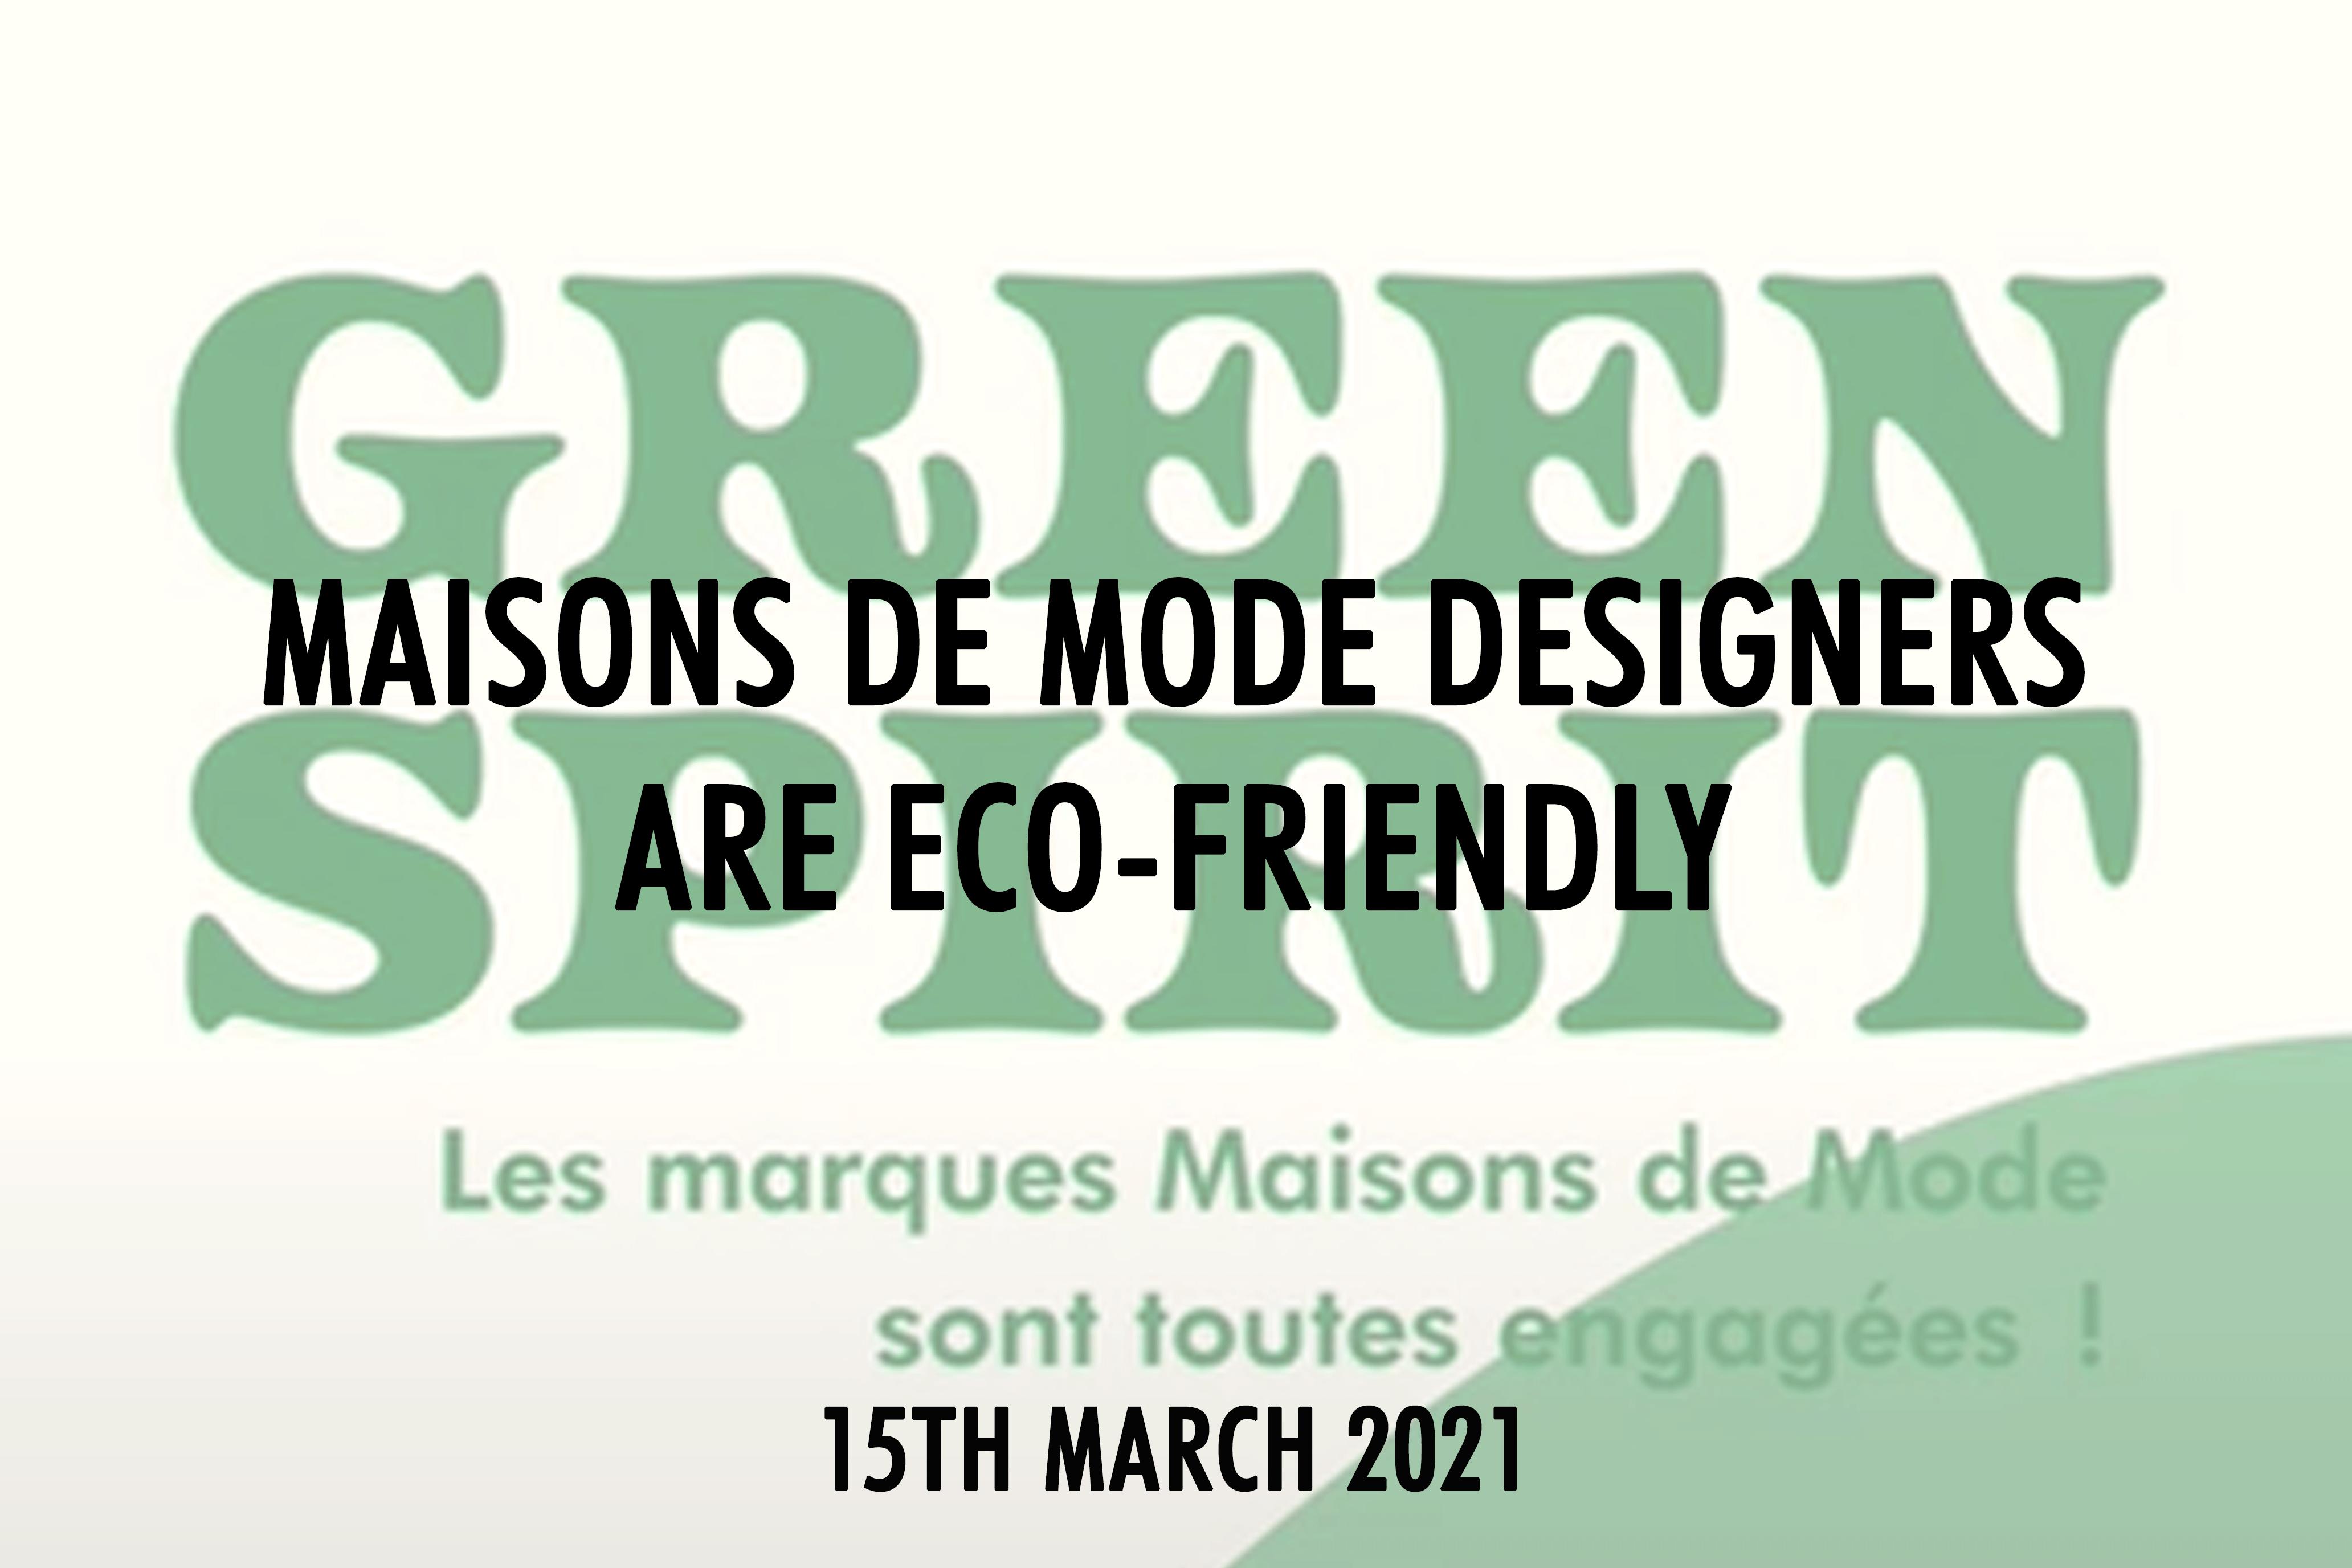 green-spirit-maisons-de-mode-substainable